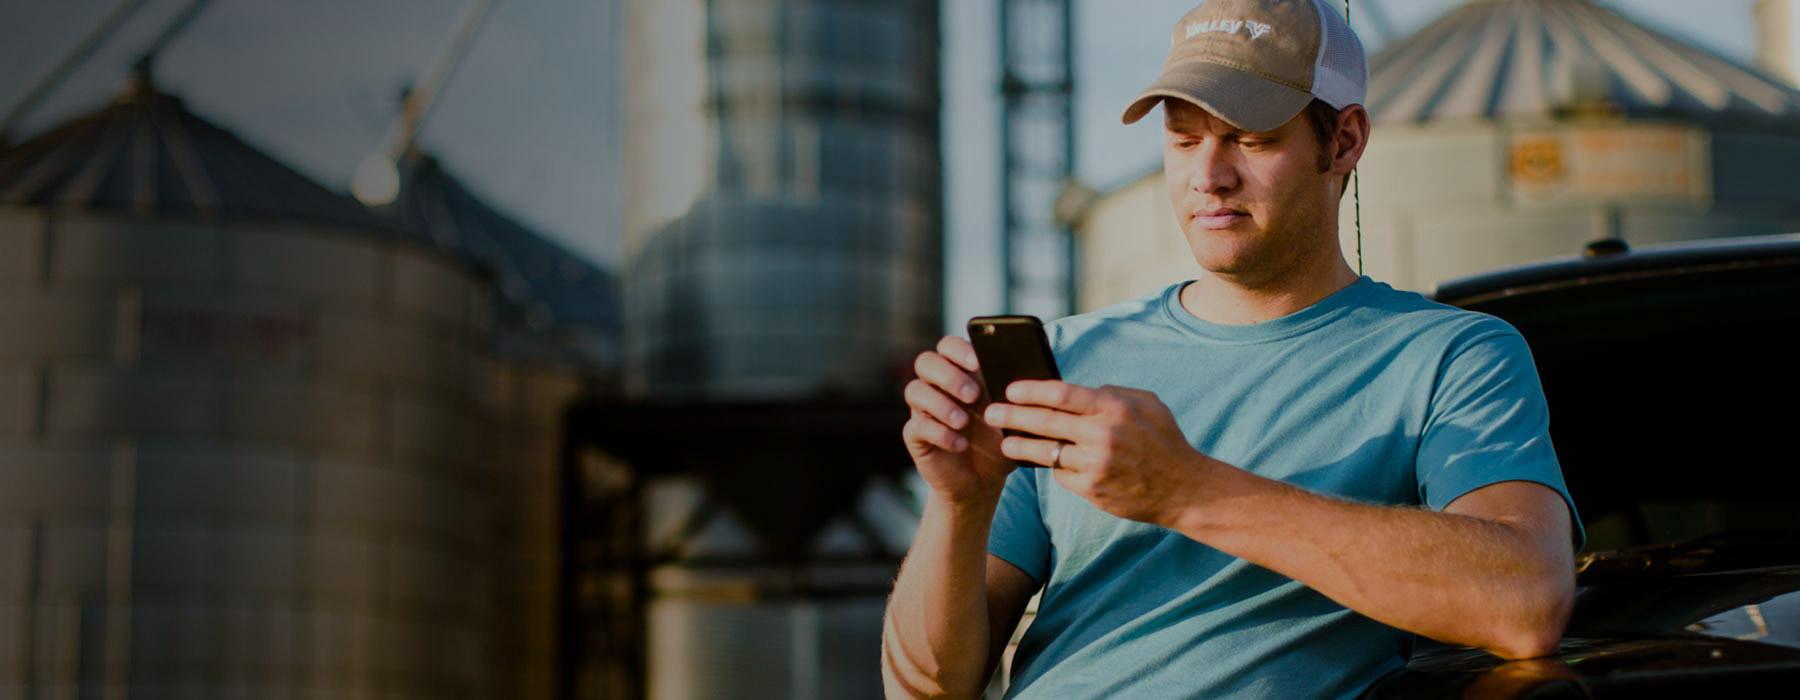 valley irrigation run time - free app